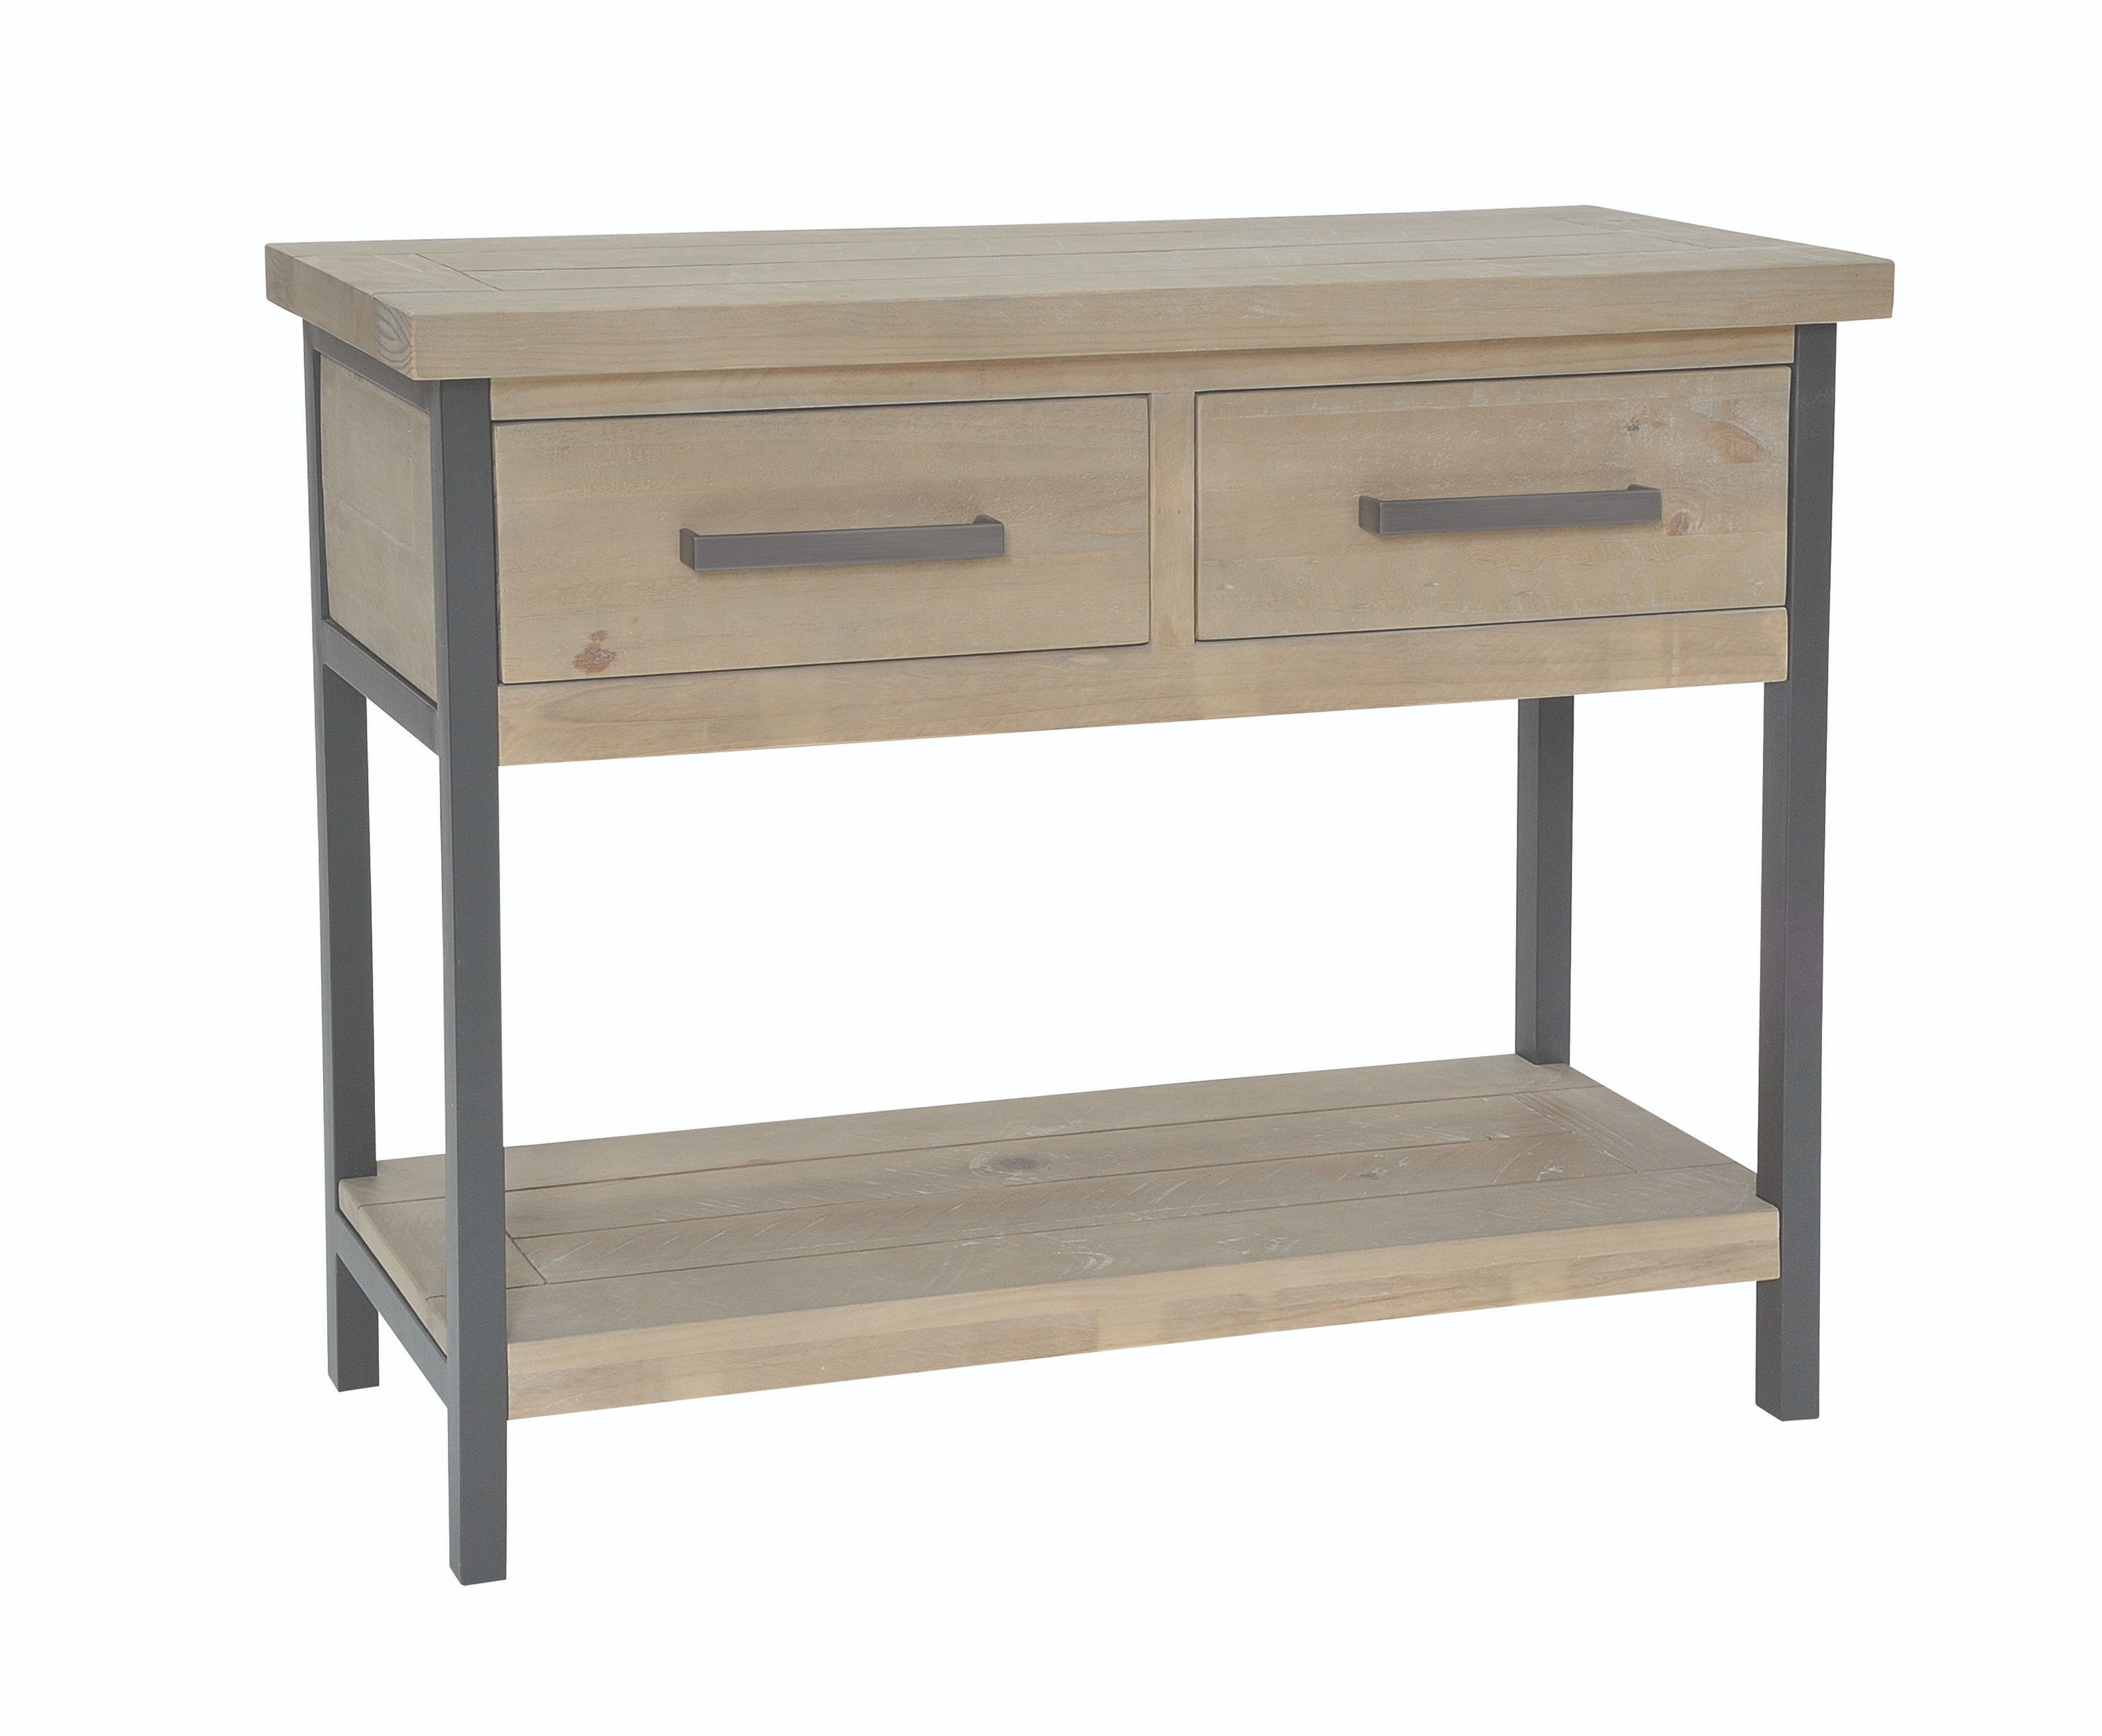 EDDISON CONSOLE TABLE Grey Wash & Steel